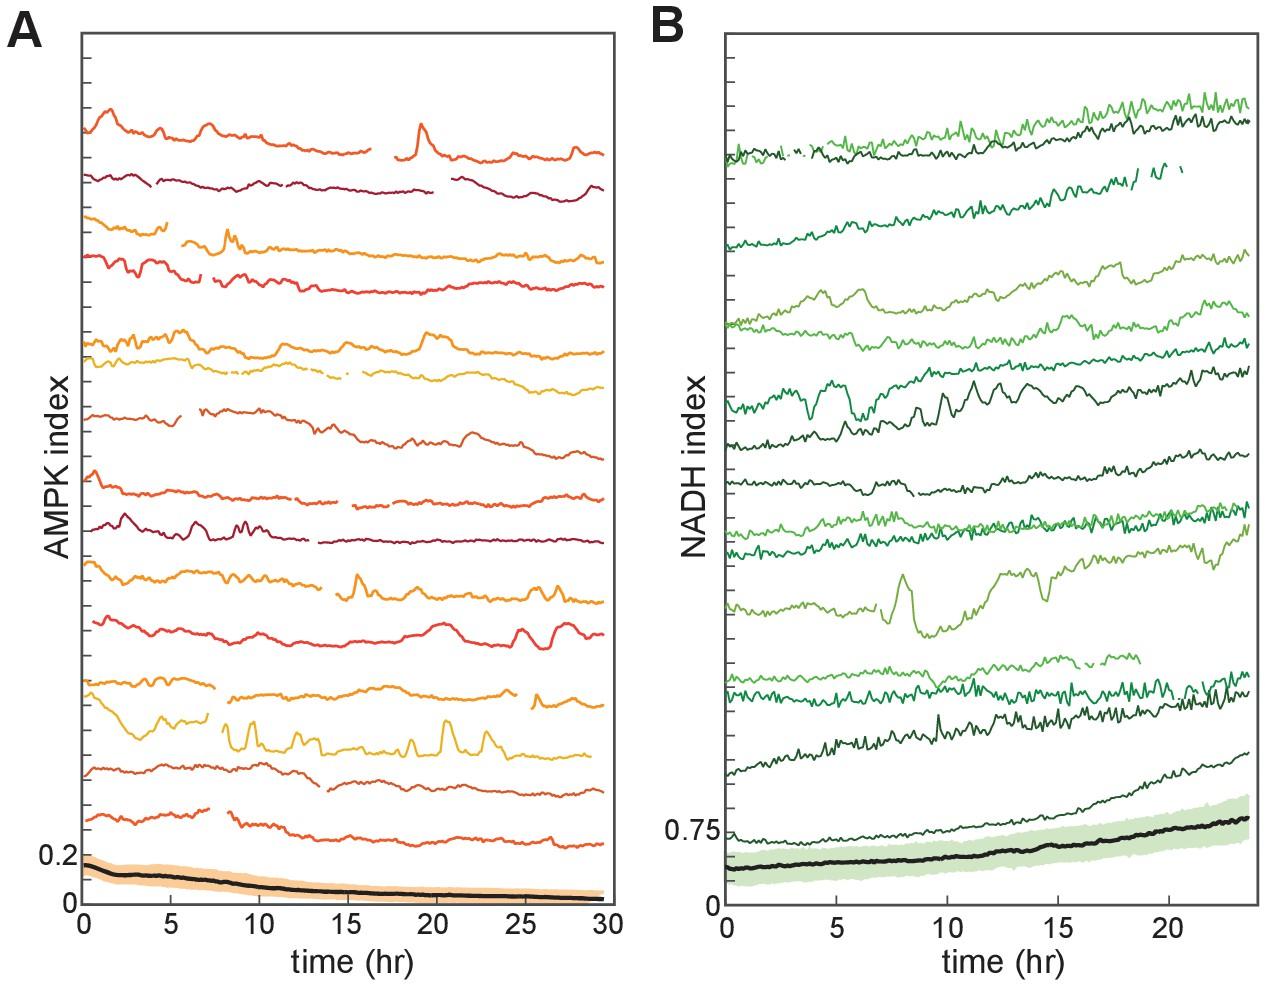 Akt regulation of glycolysis mediates bioenergetic stability